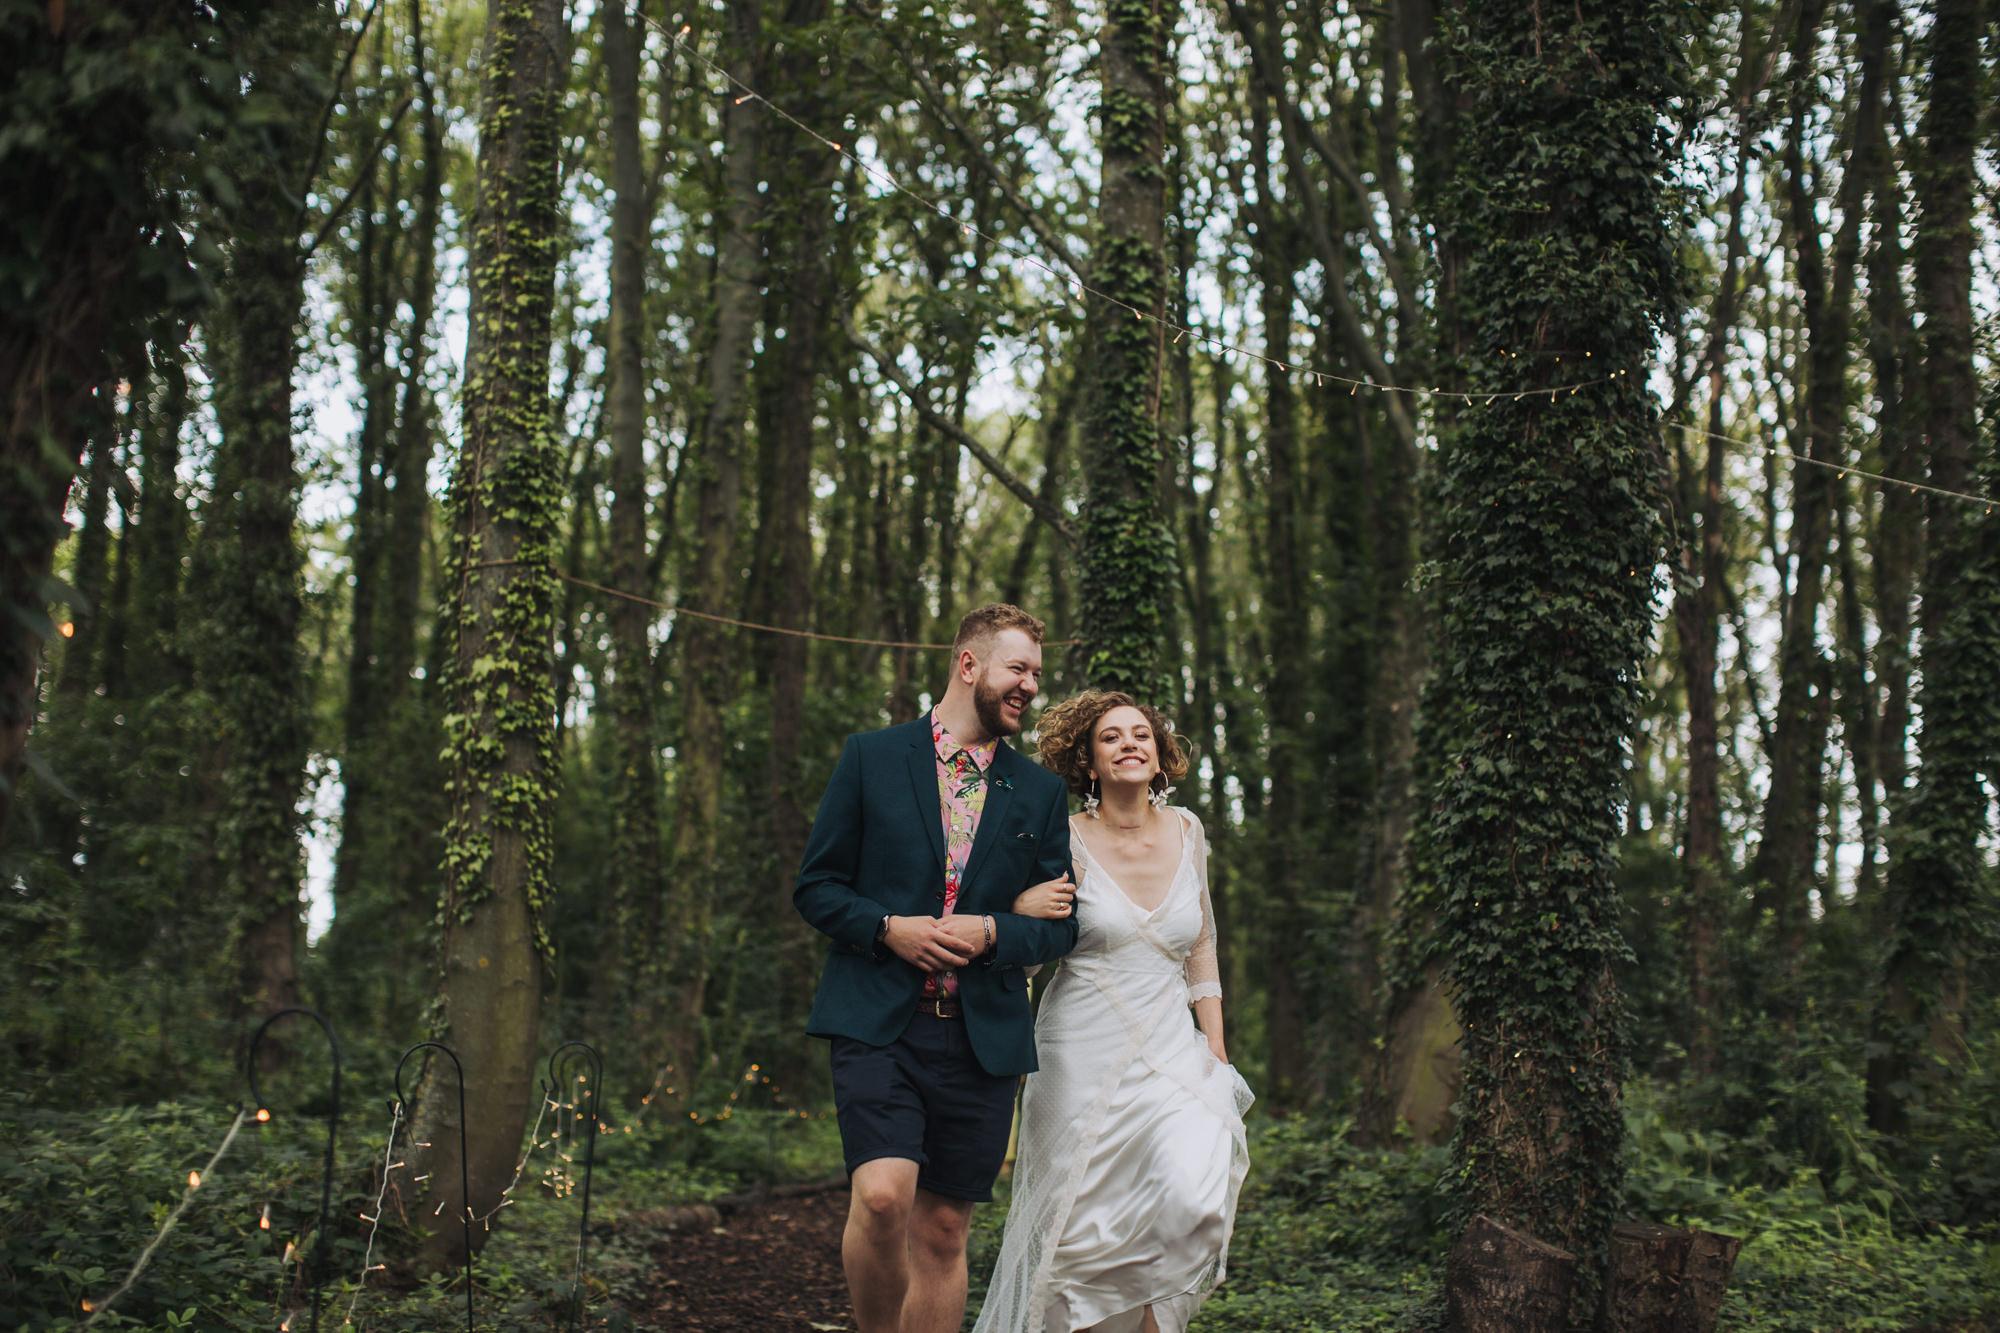 applewood wedding photographer leeds, yorkshire30.jpg